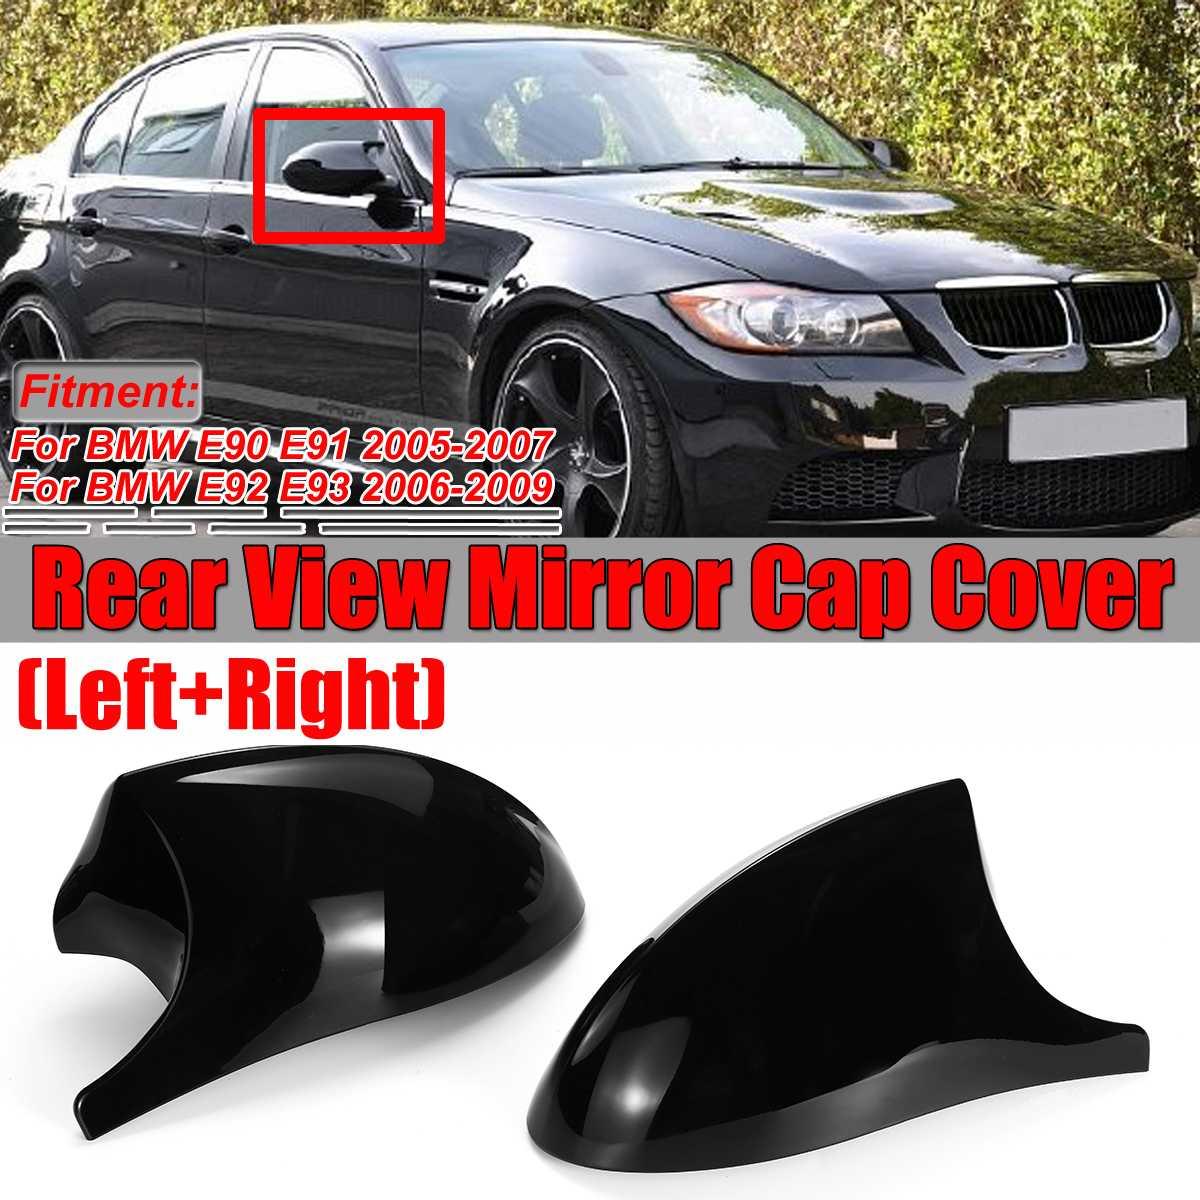 2x คาร์บอนไฟเบอร์/ABS กระจก E90 ด้านข้างรถด้านหลังกระจกมองข้างสำหรับ BMW E90 E91 e92 E93 M3 สไตล์ E80 E81 E87